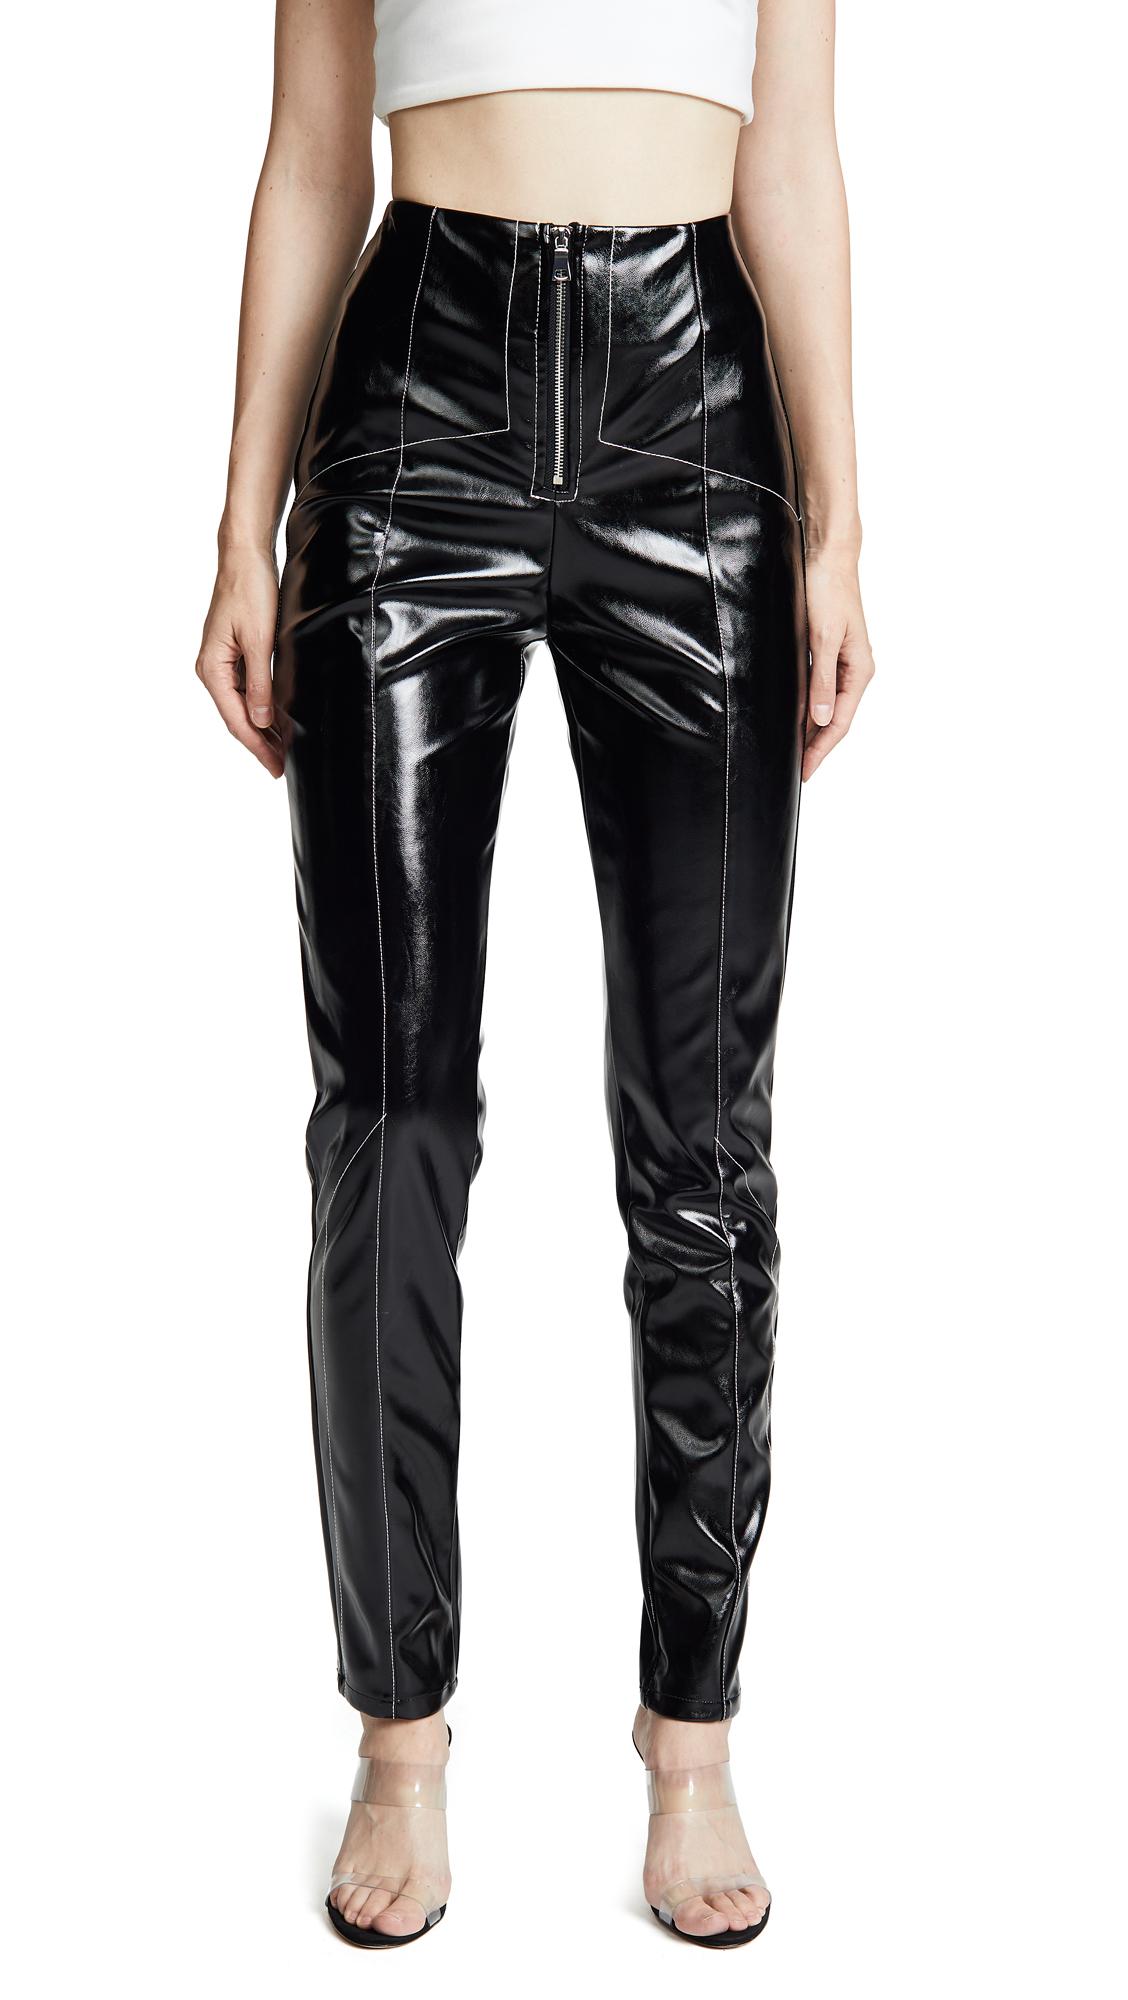 I.AM. GIA Winona 2.0 Pants